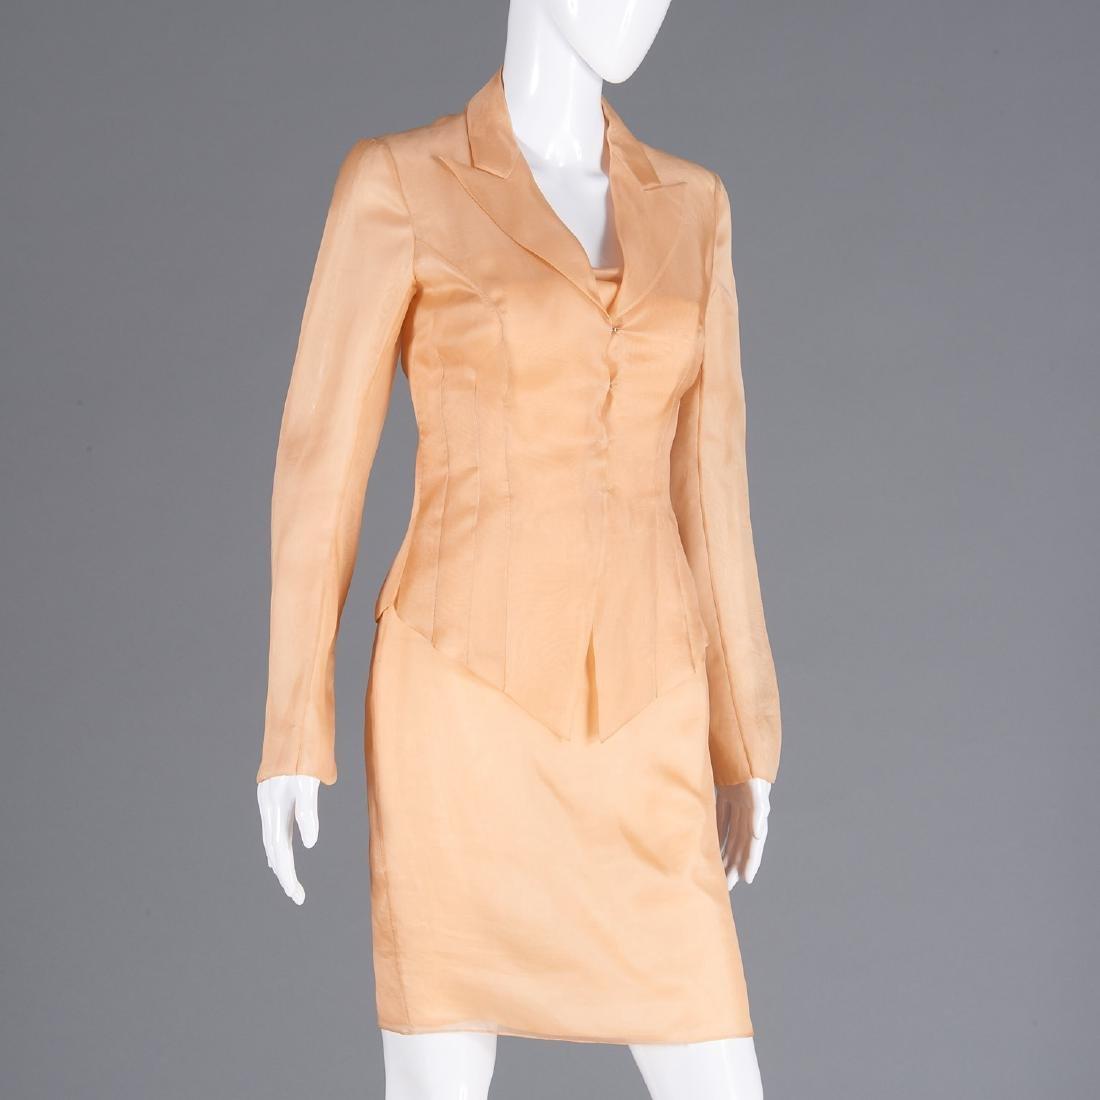 Richard Tyler Couture silk dress, jacket, & pants